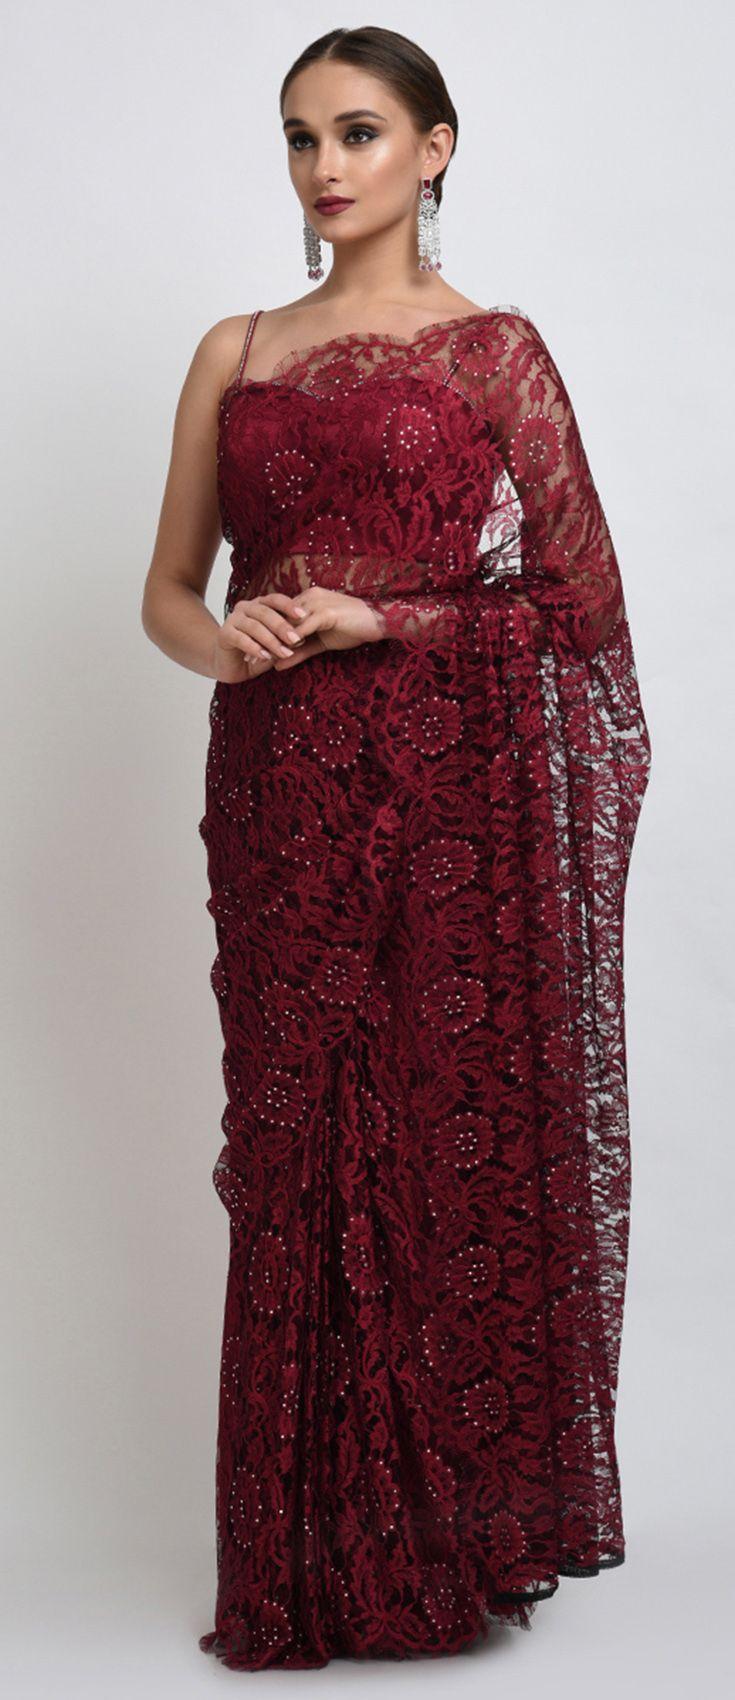 Maroon-Black French Chantilly Lace Swarovski Crystal Saree And Blouse